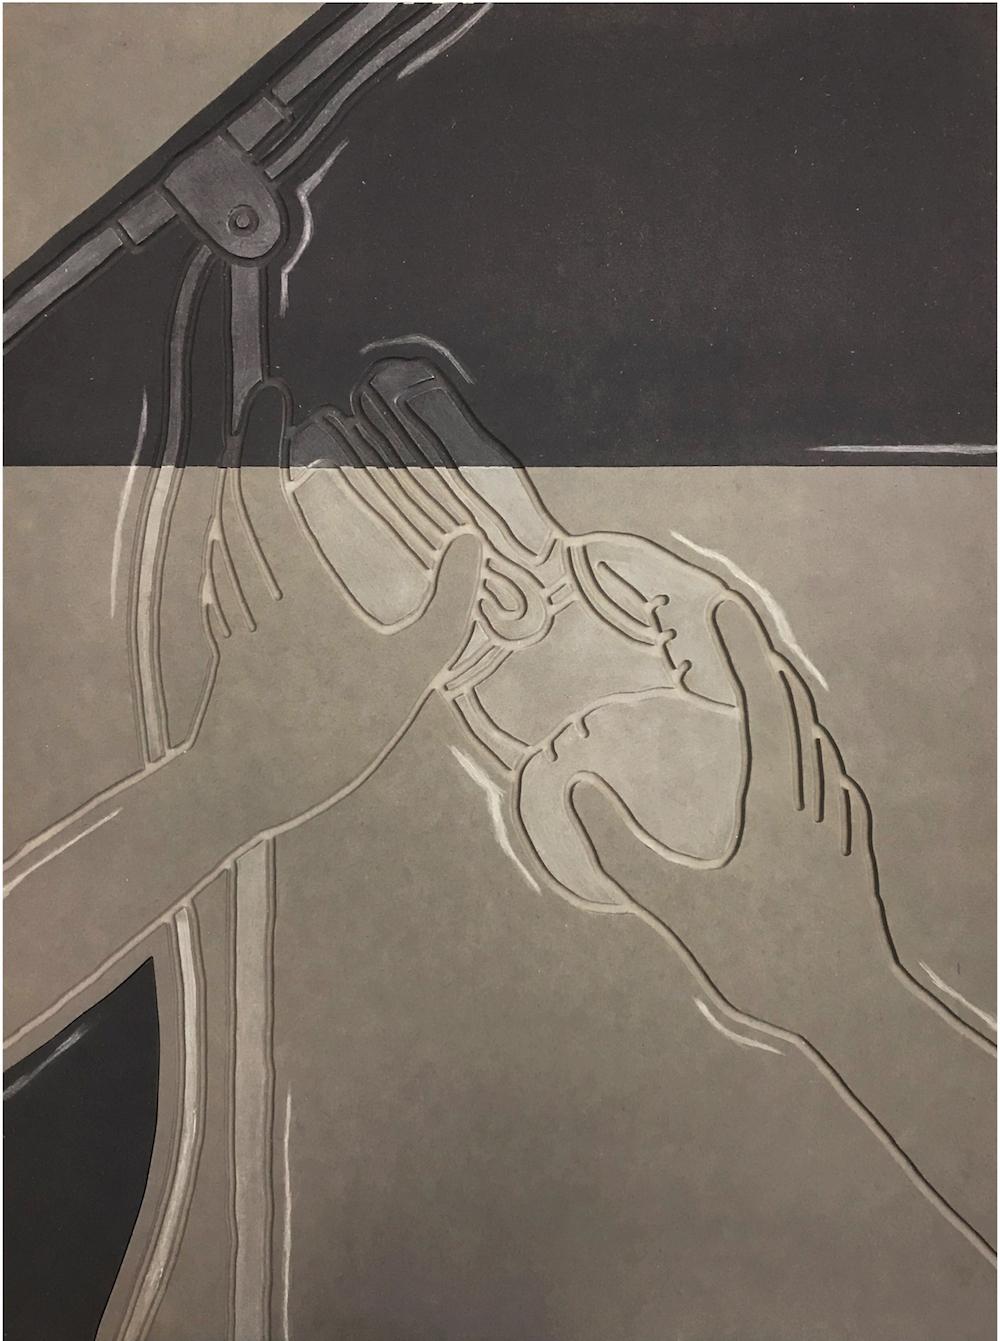 Milly Peck, Spot effect: Impact, 2019. Valchromat. 78 x 59 x 5 cm.